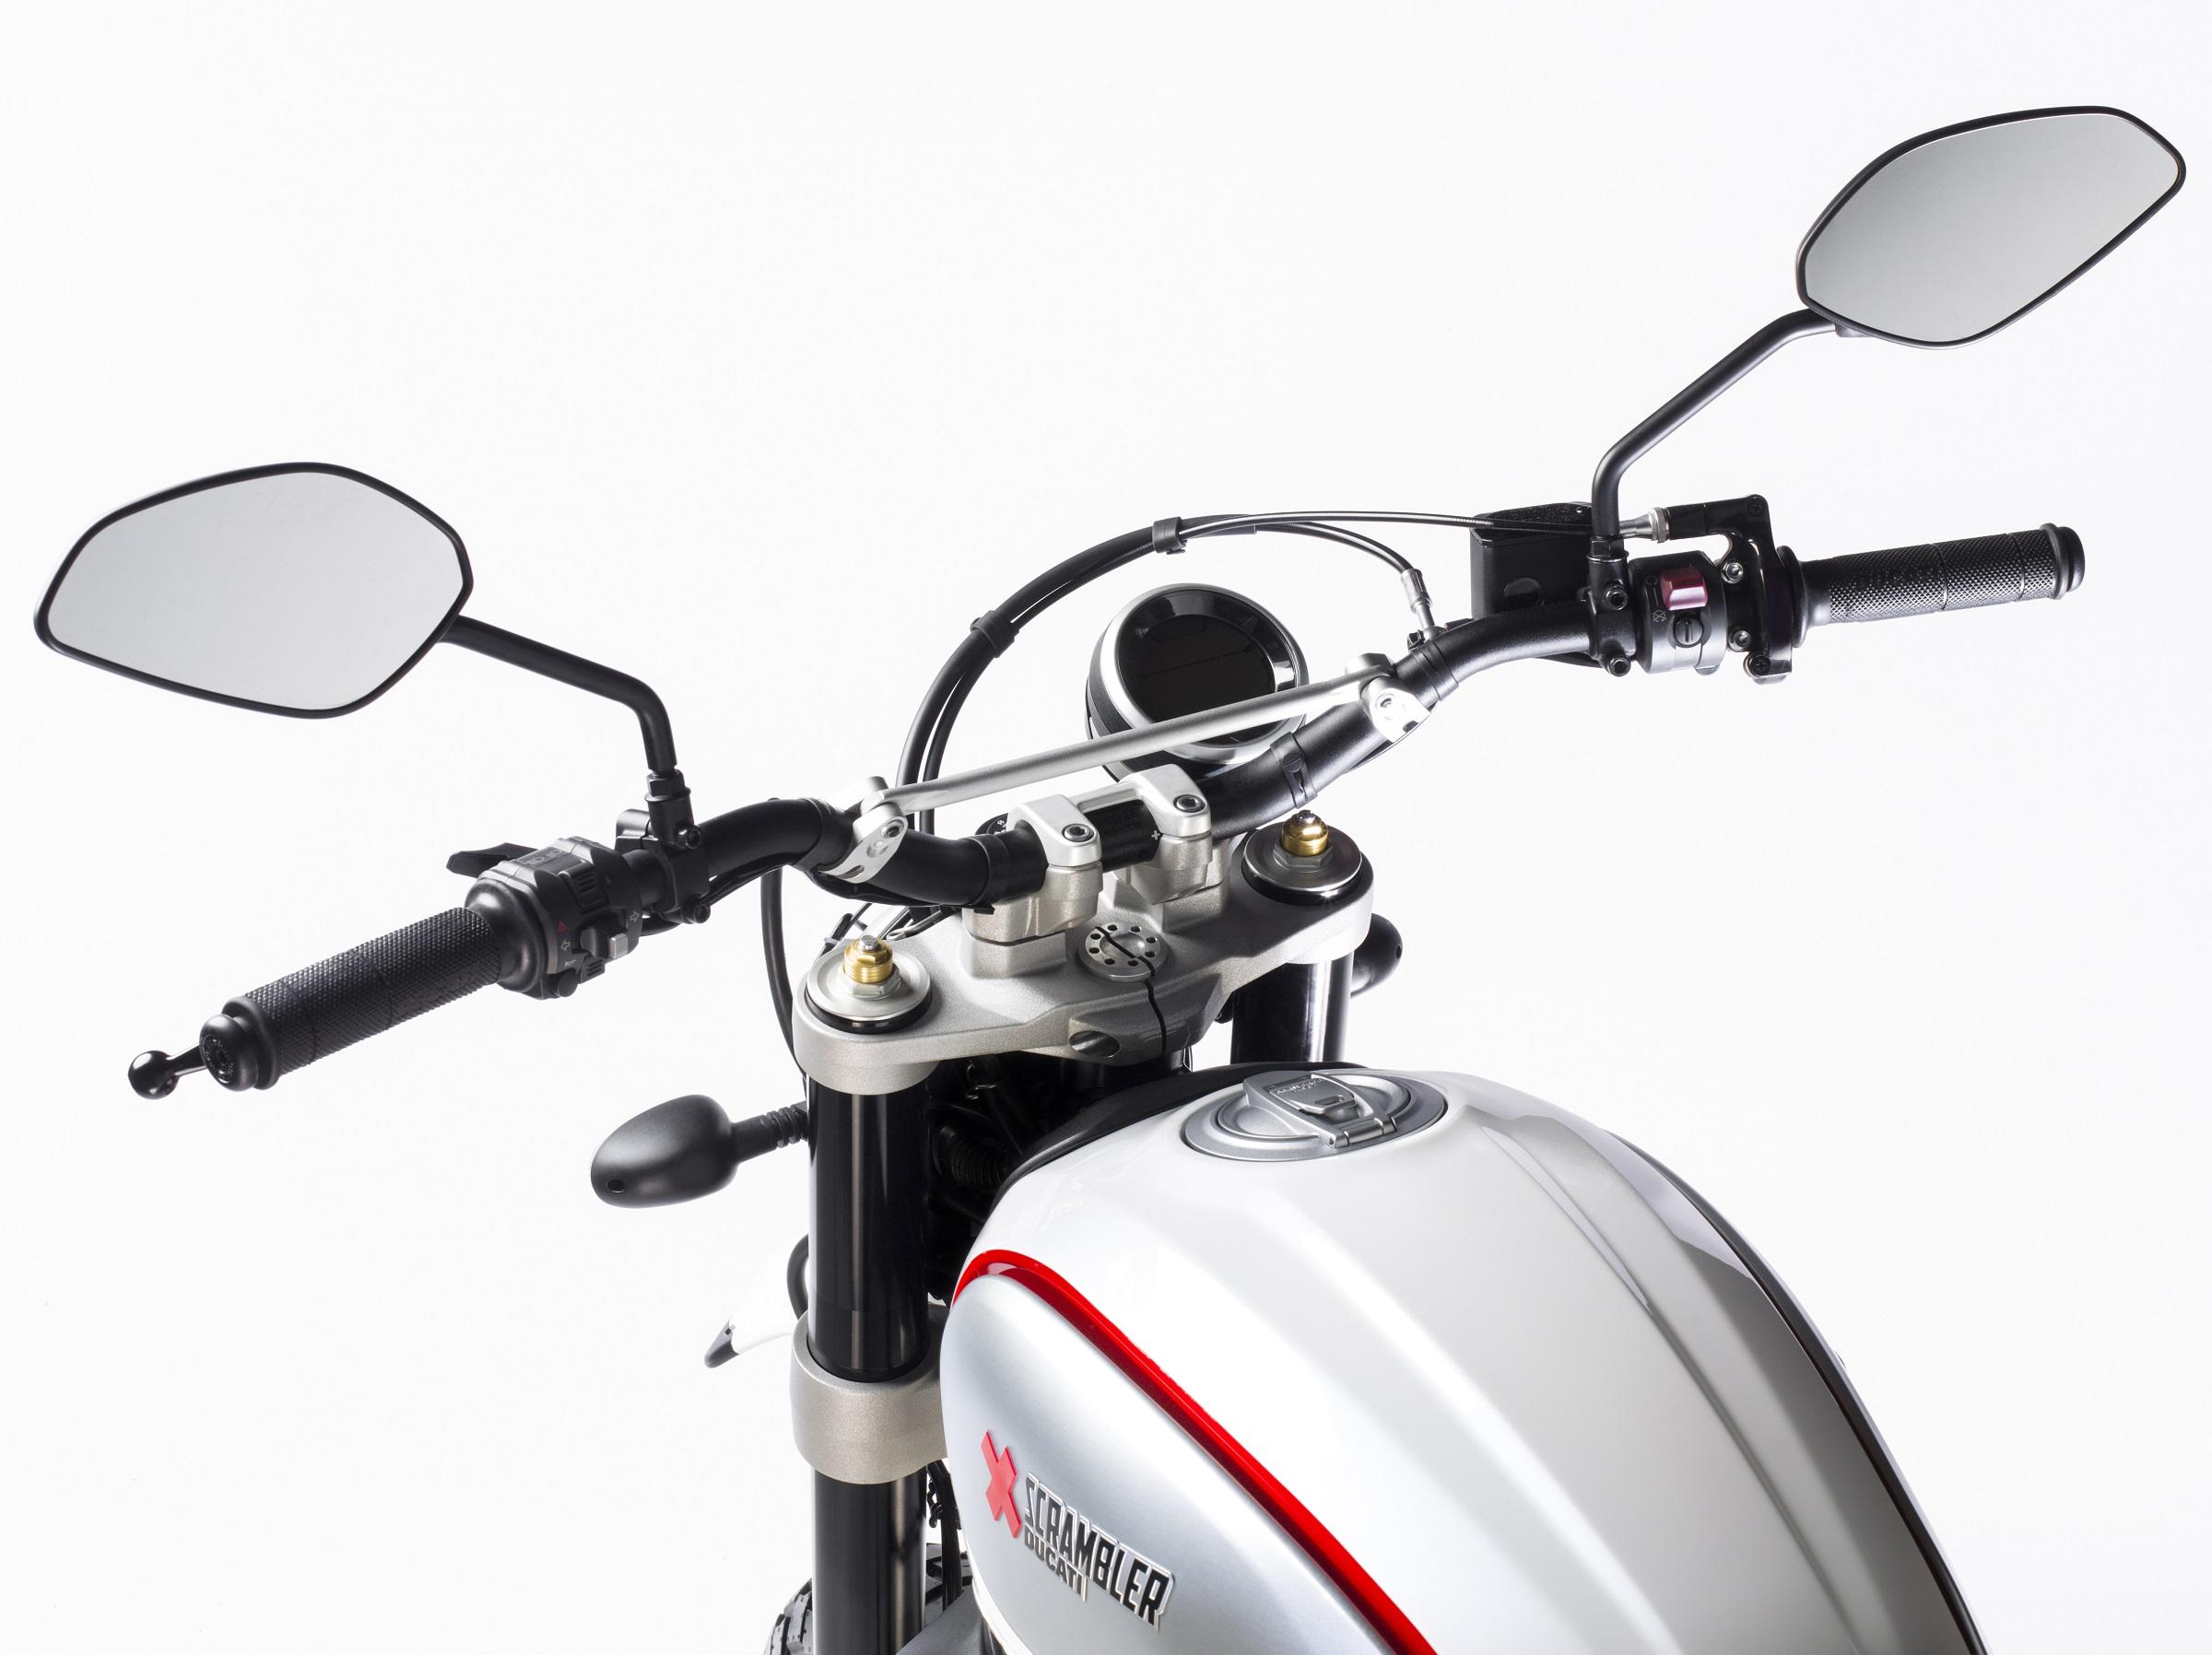 Manhattan To Mud 700 Miles On A Ducati Scrambler Desert Sled Revzilla Yamaha In Line Fuel Filters